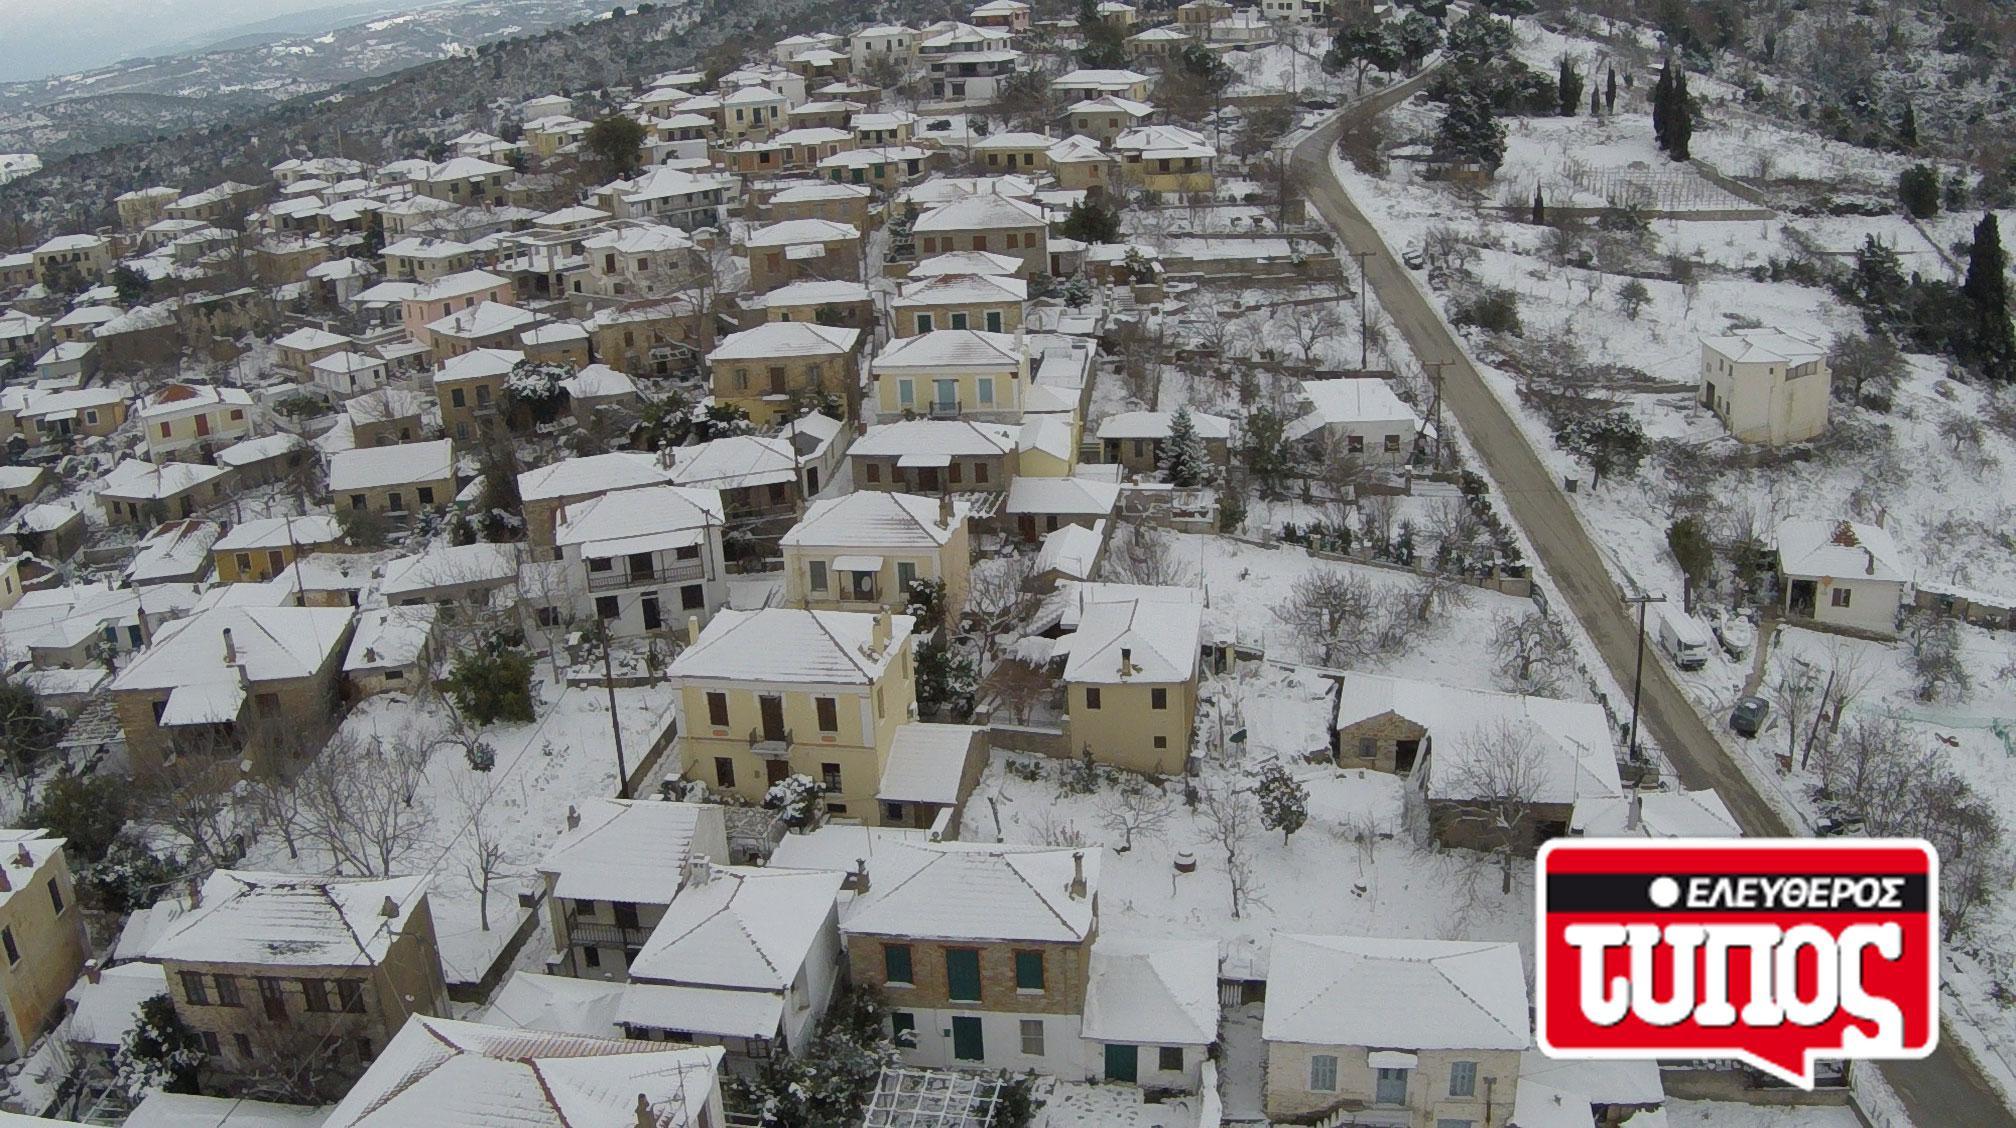 laukos-piliou-xionismenos-aerofotografies-1300-10 Εντυπωσιακές αεροφωτογραφίες από το χιονισμένο Λαύκο Πηλίου [εικόνες]